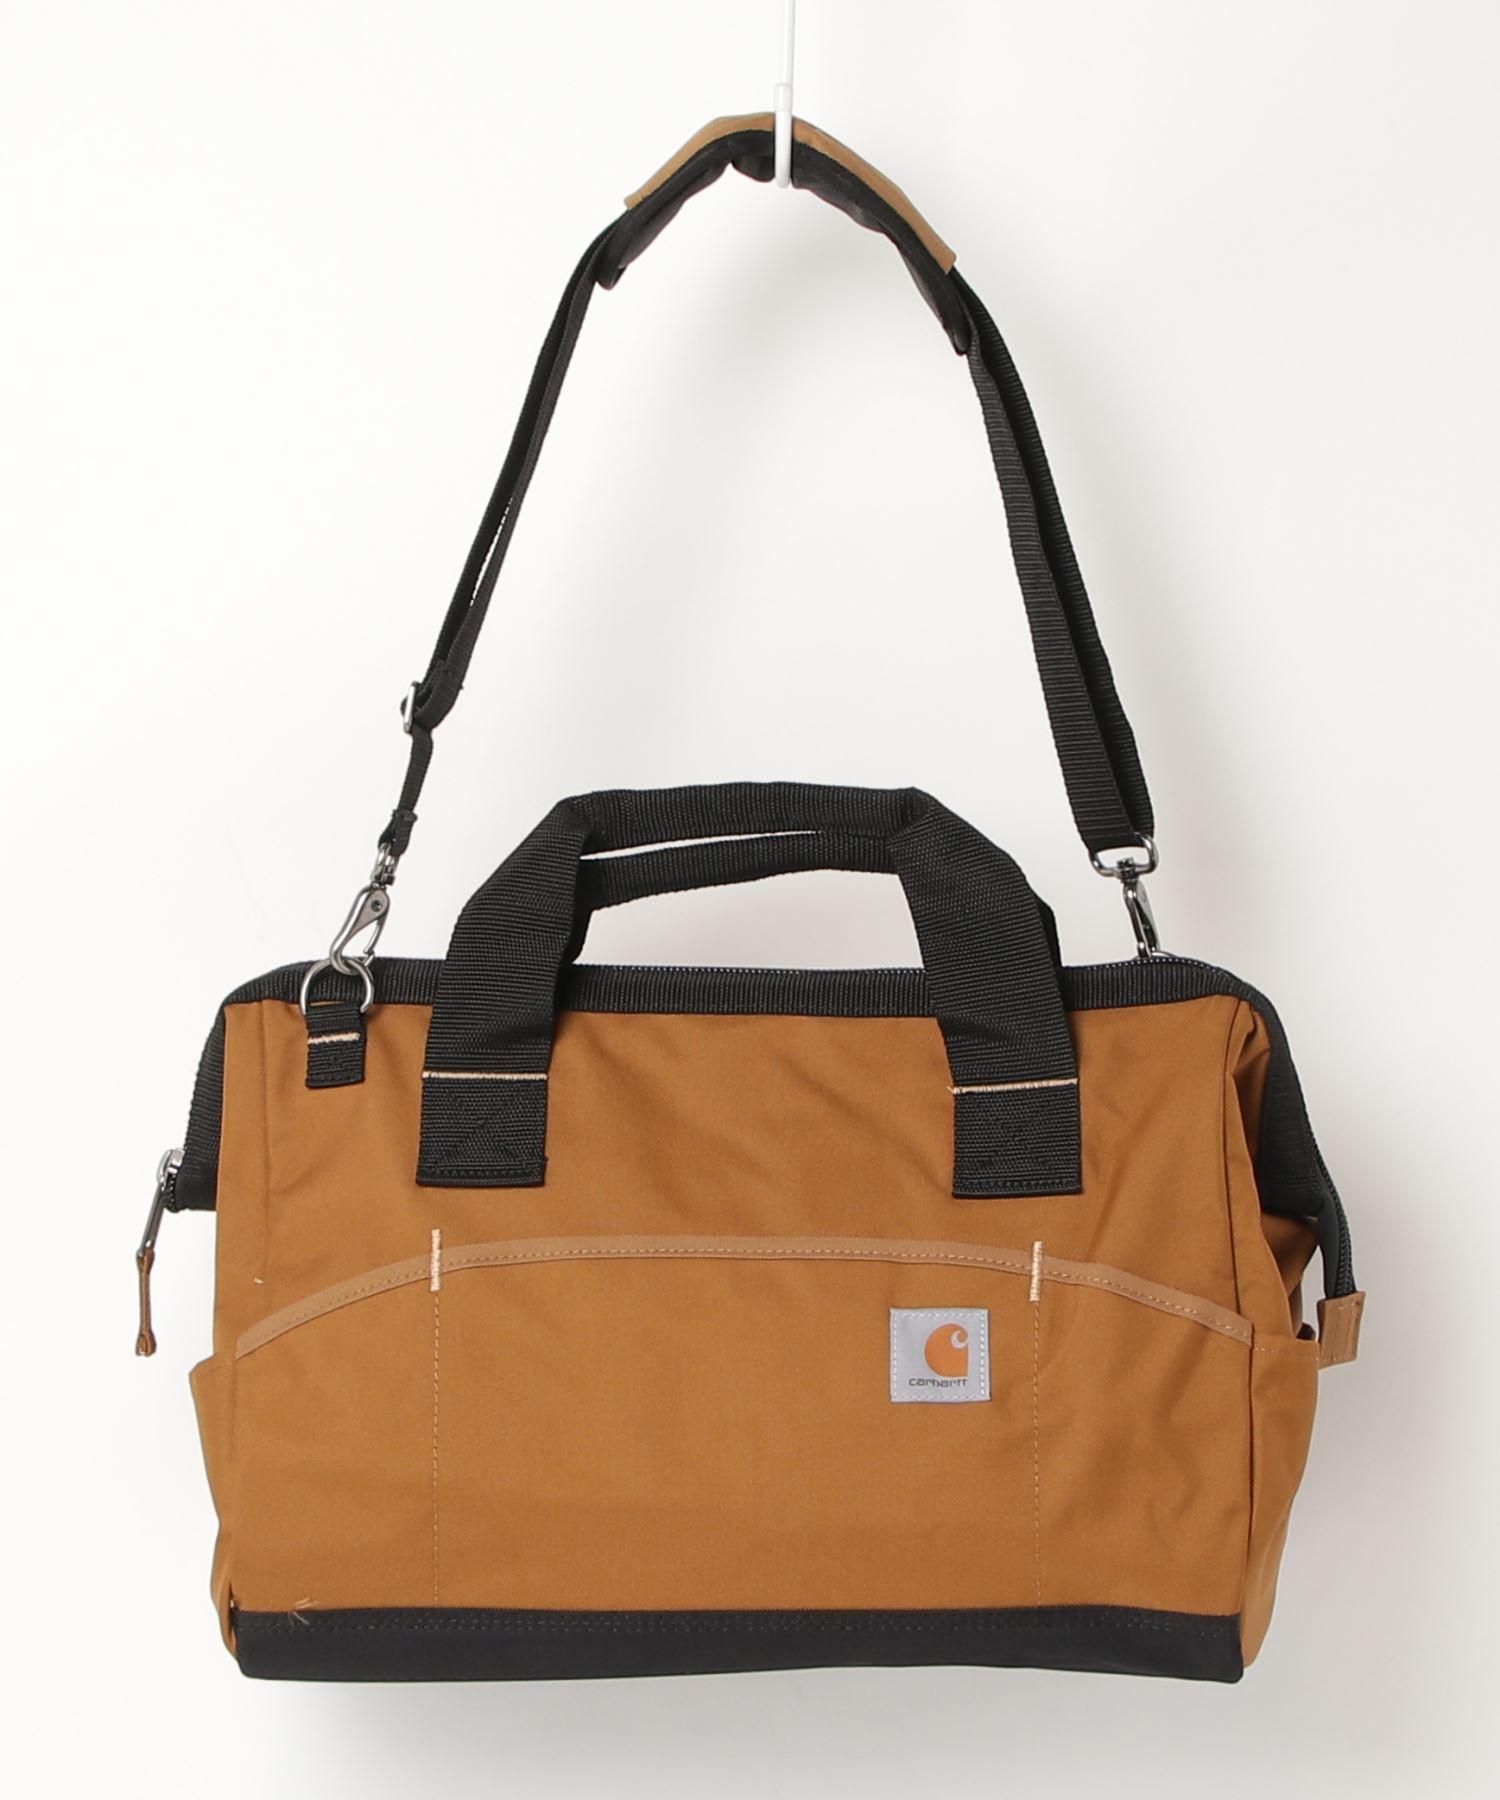 【 carhartt / カーハート 】 Midweight Tool Bag CT0102 マルチツールバッグ